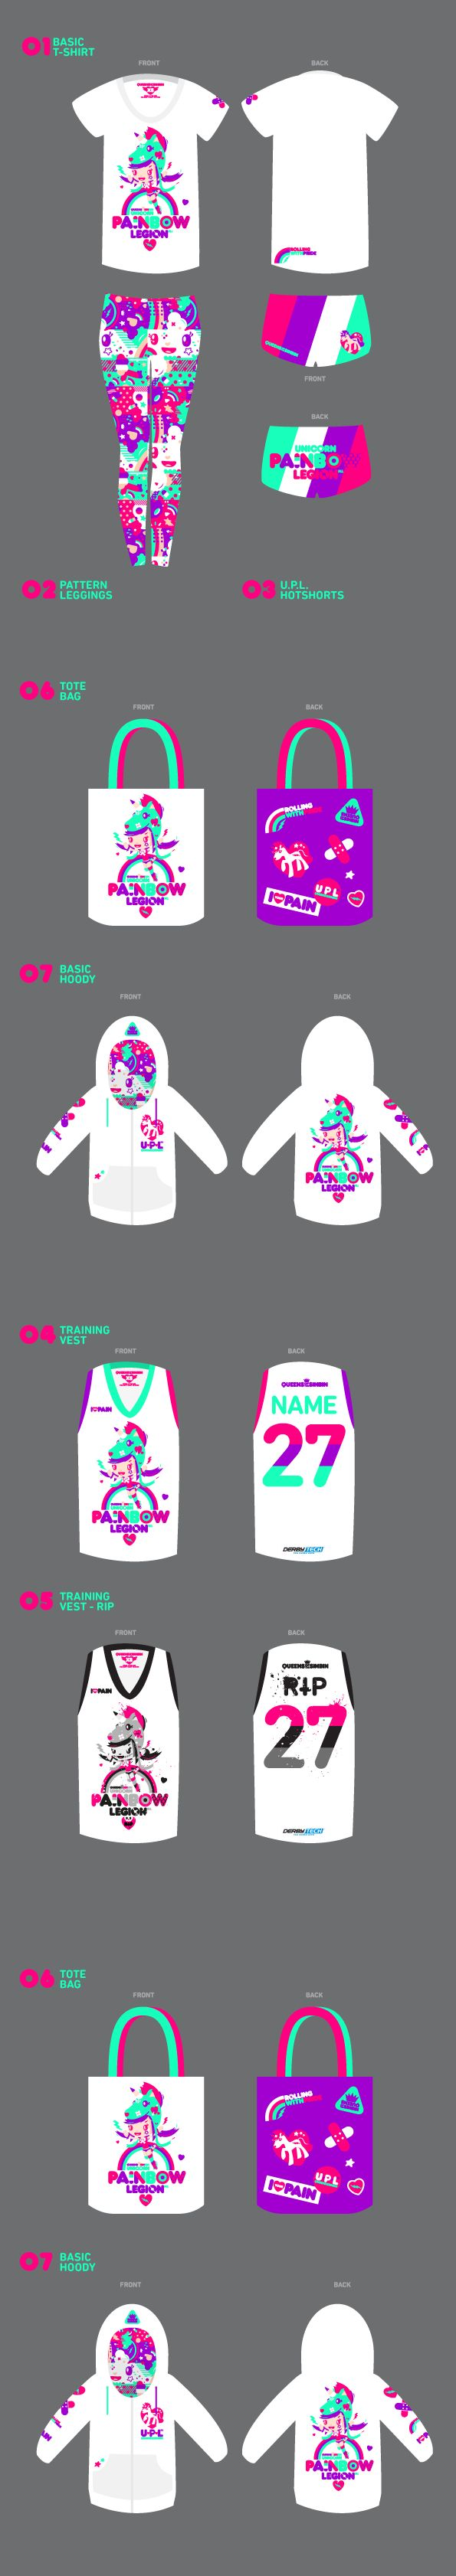 AOKU x QUEENS OF THE SIN BIN LINE-UP [rollerderby uniform brand]